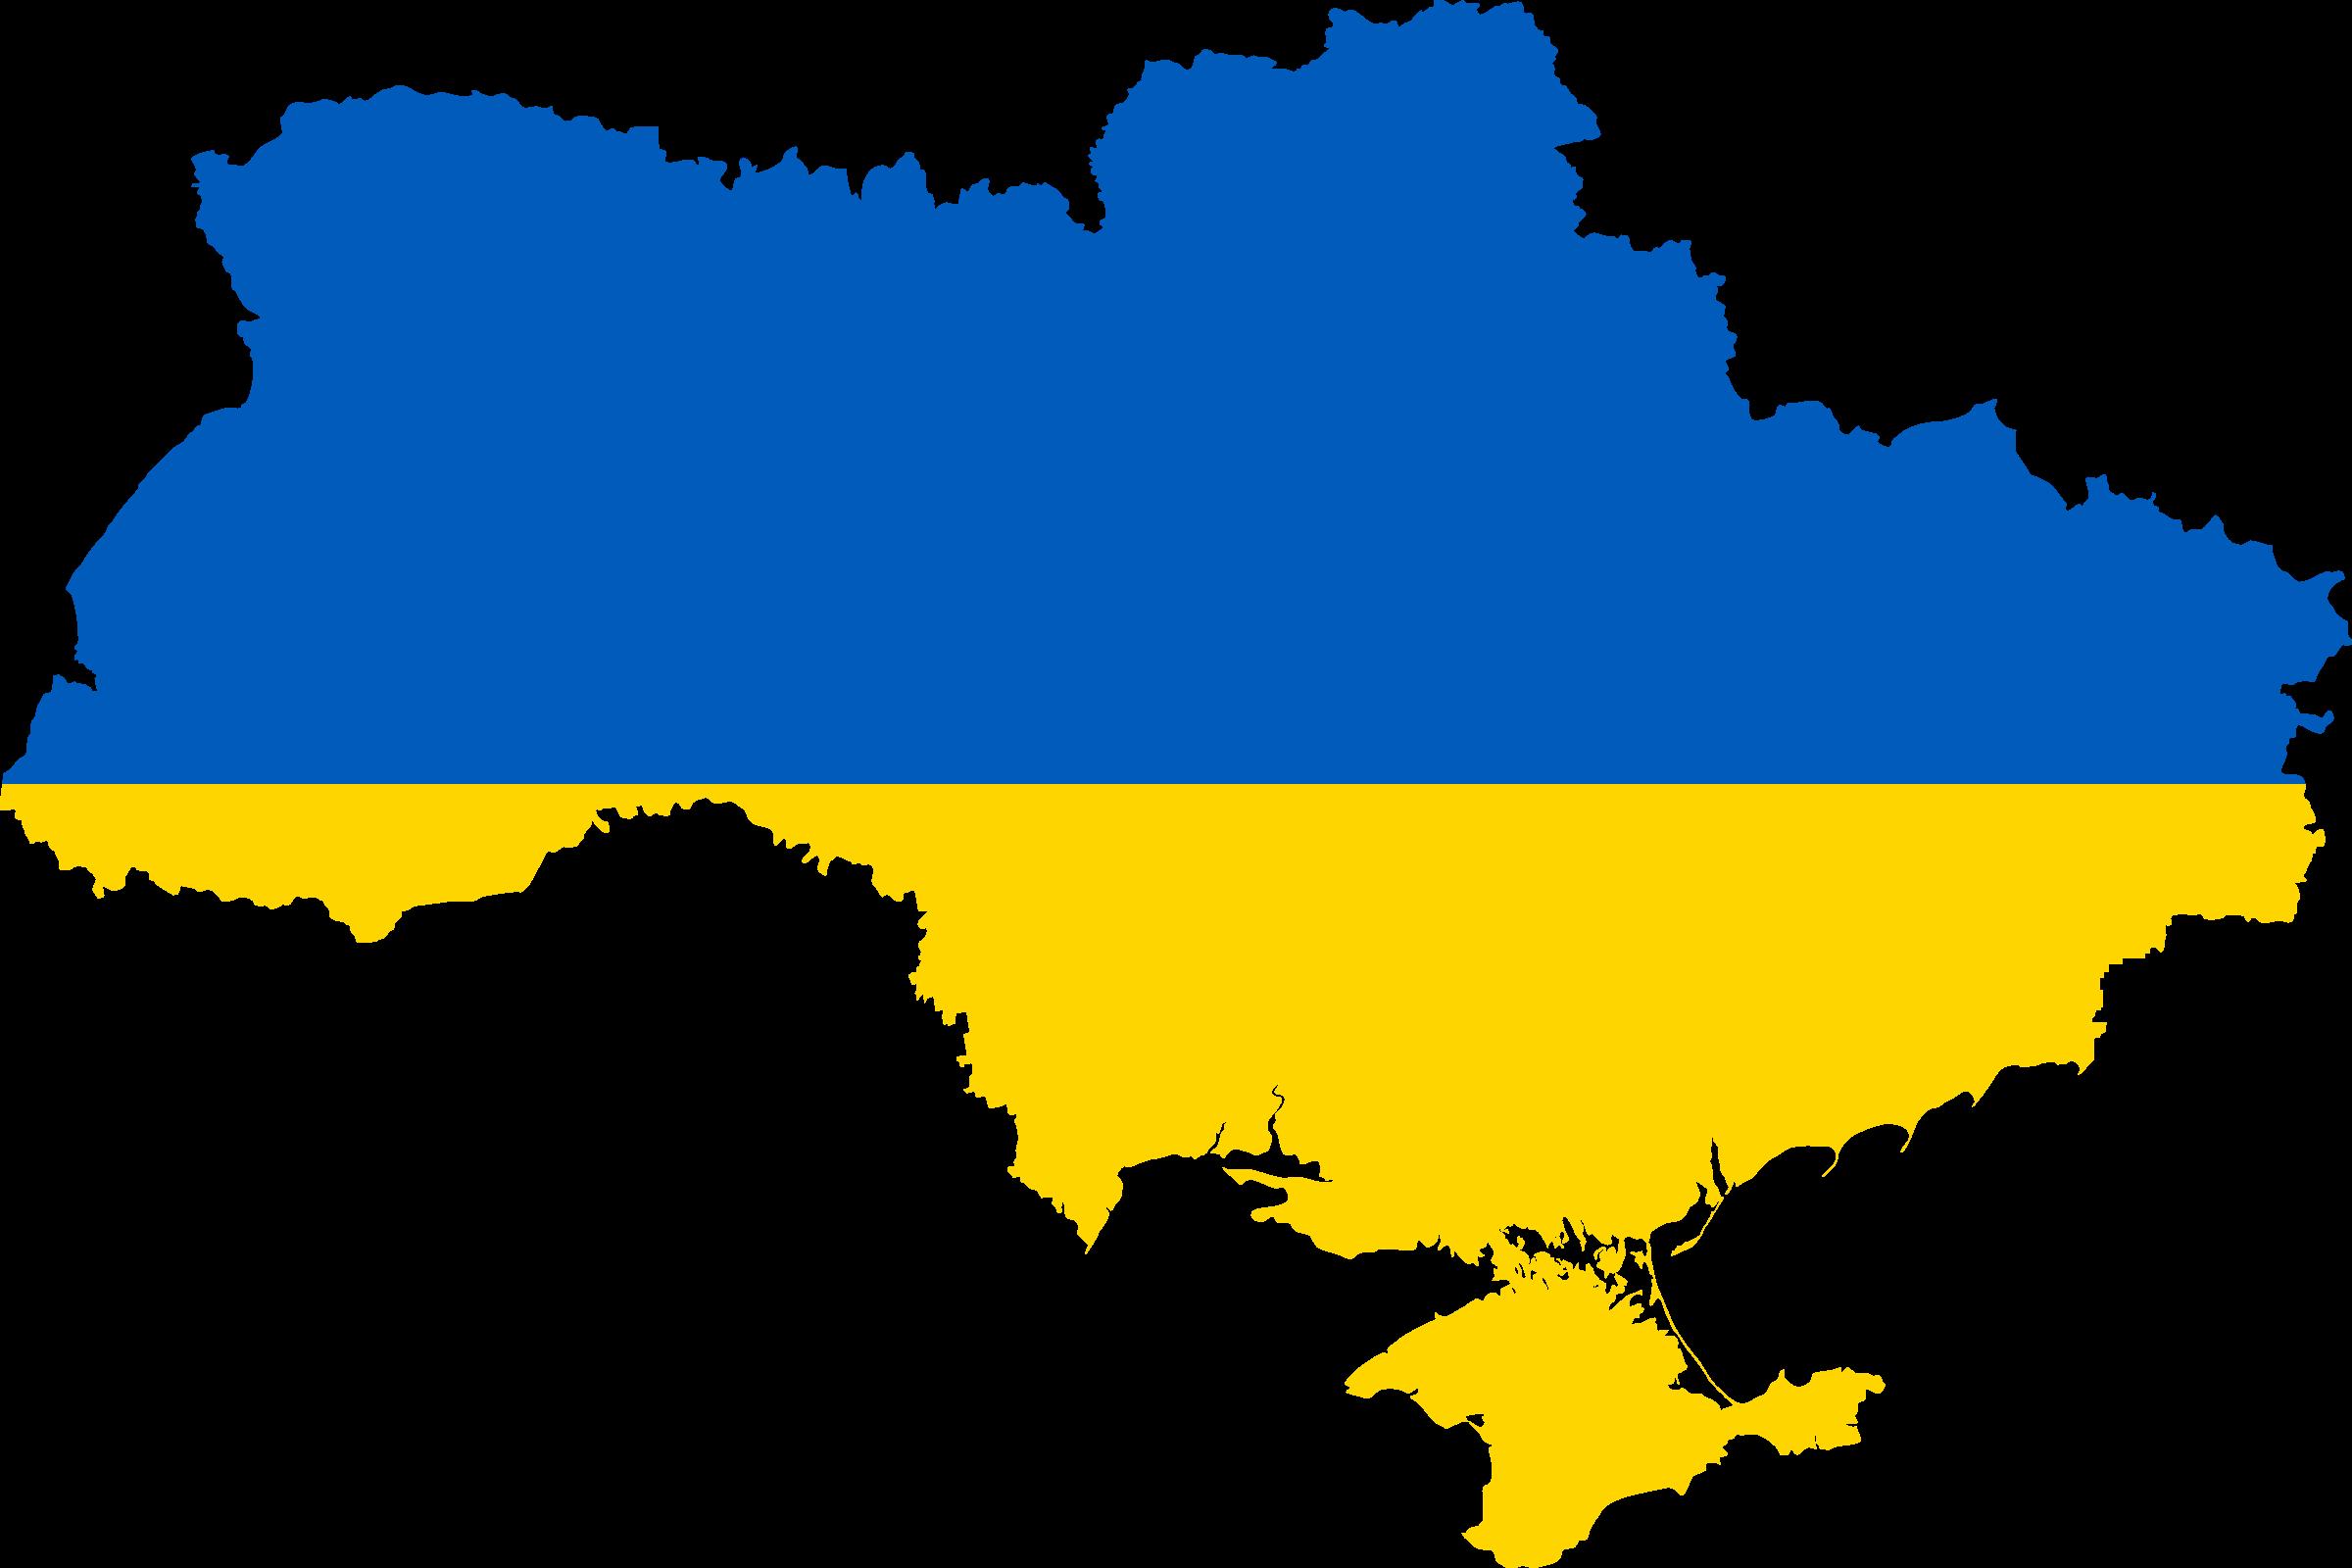 Ukraine adventurous travels adventure. Europe clipart sight